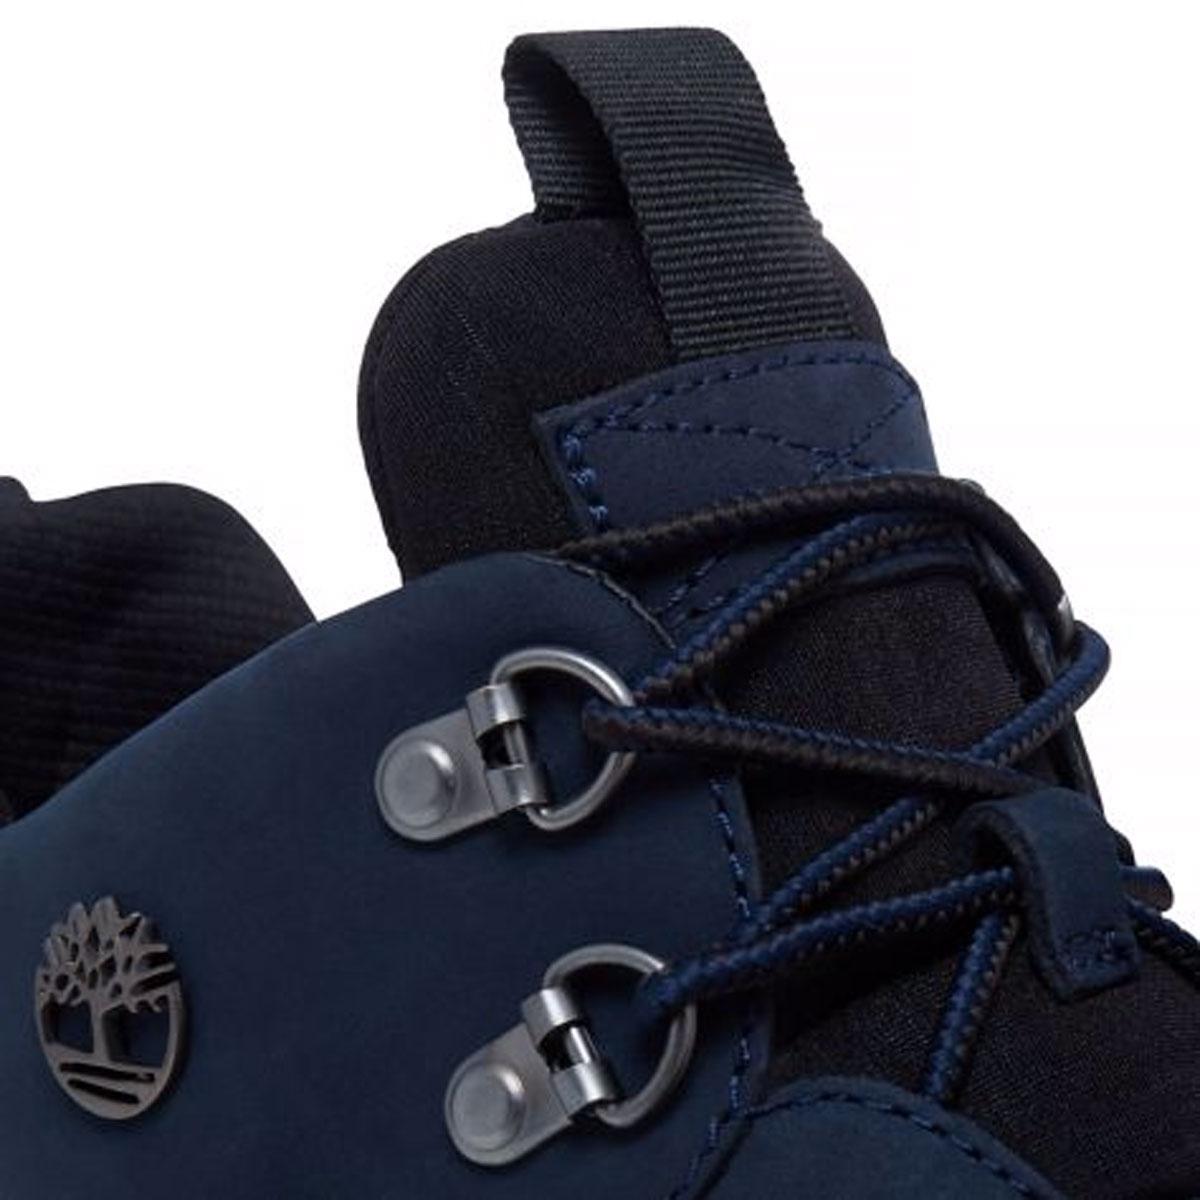 ... Image of Timberland Killington Hiker Chukka Casual Boots (Men s) - Navy  Nubuck ... 62d5d5e9d2c8